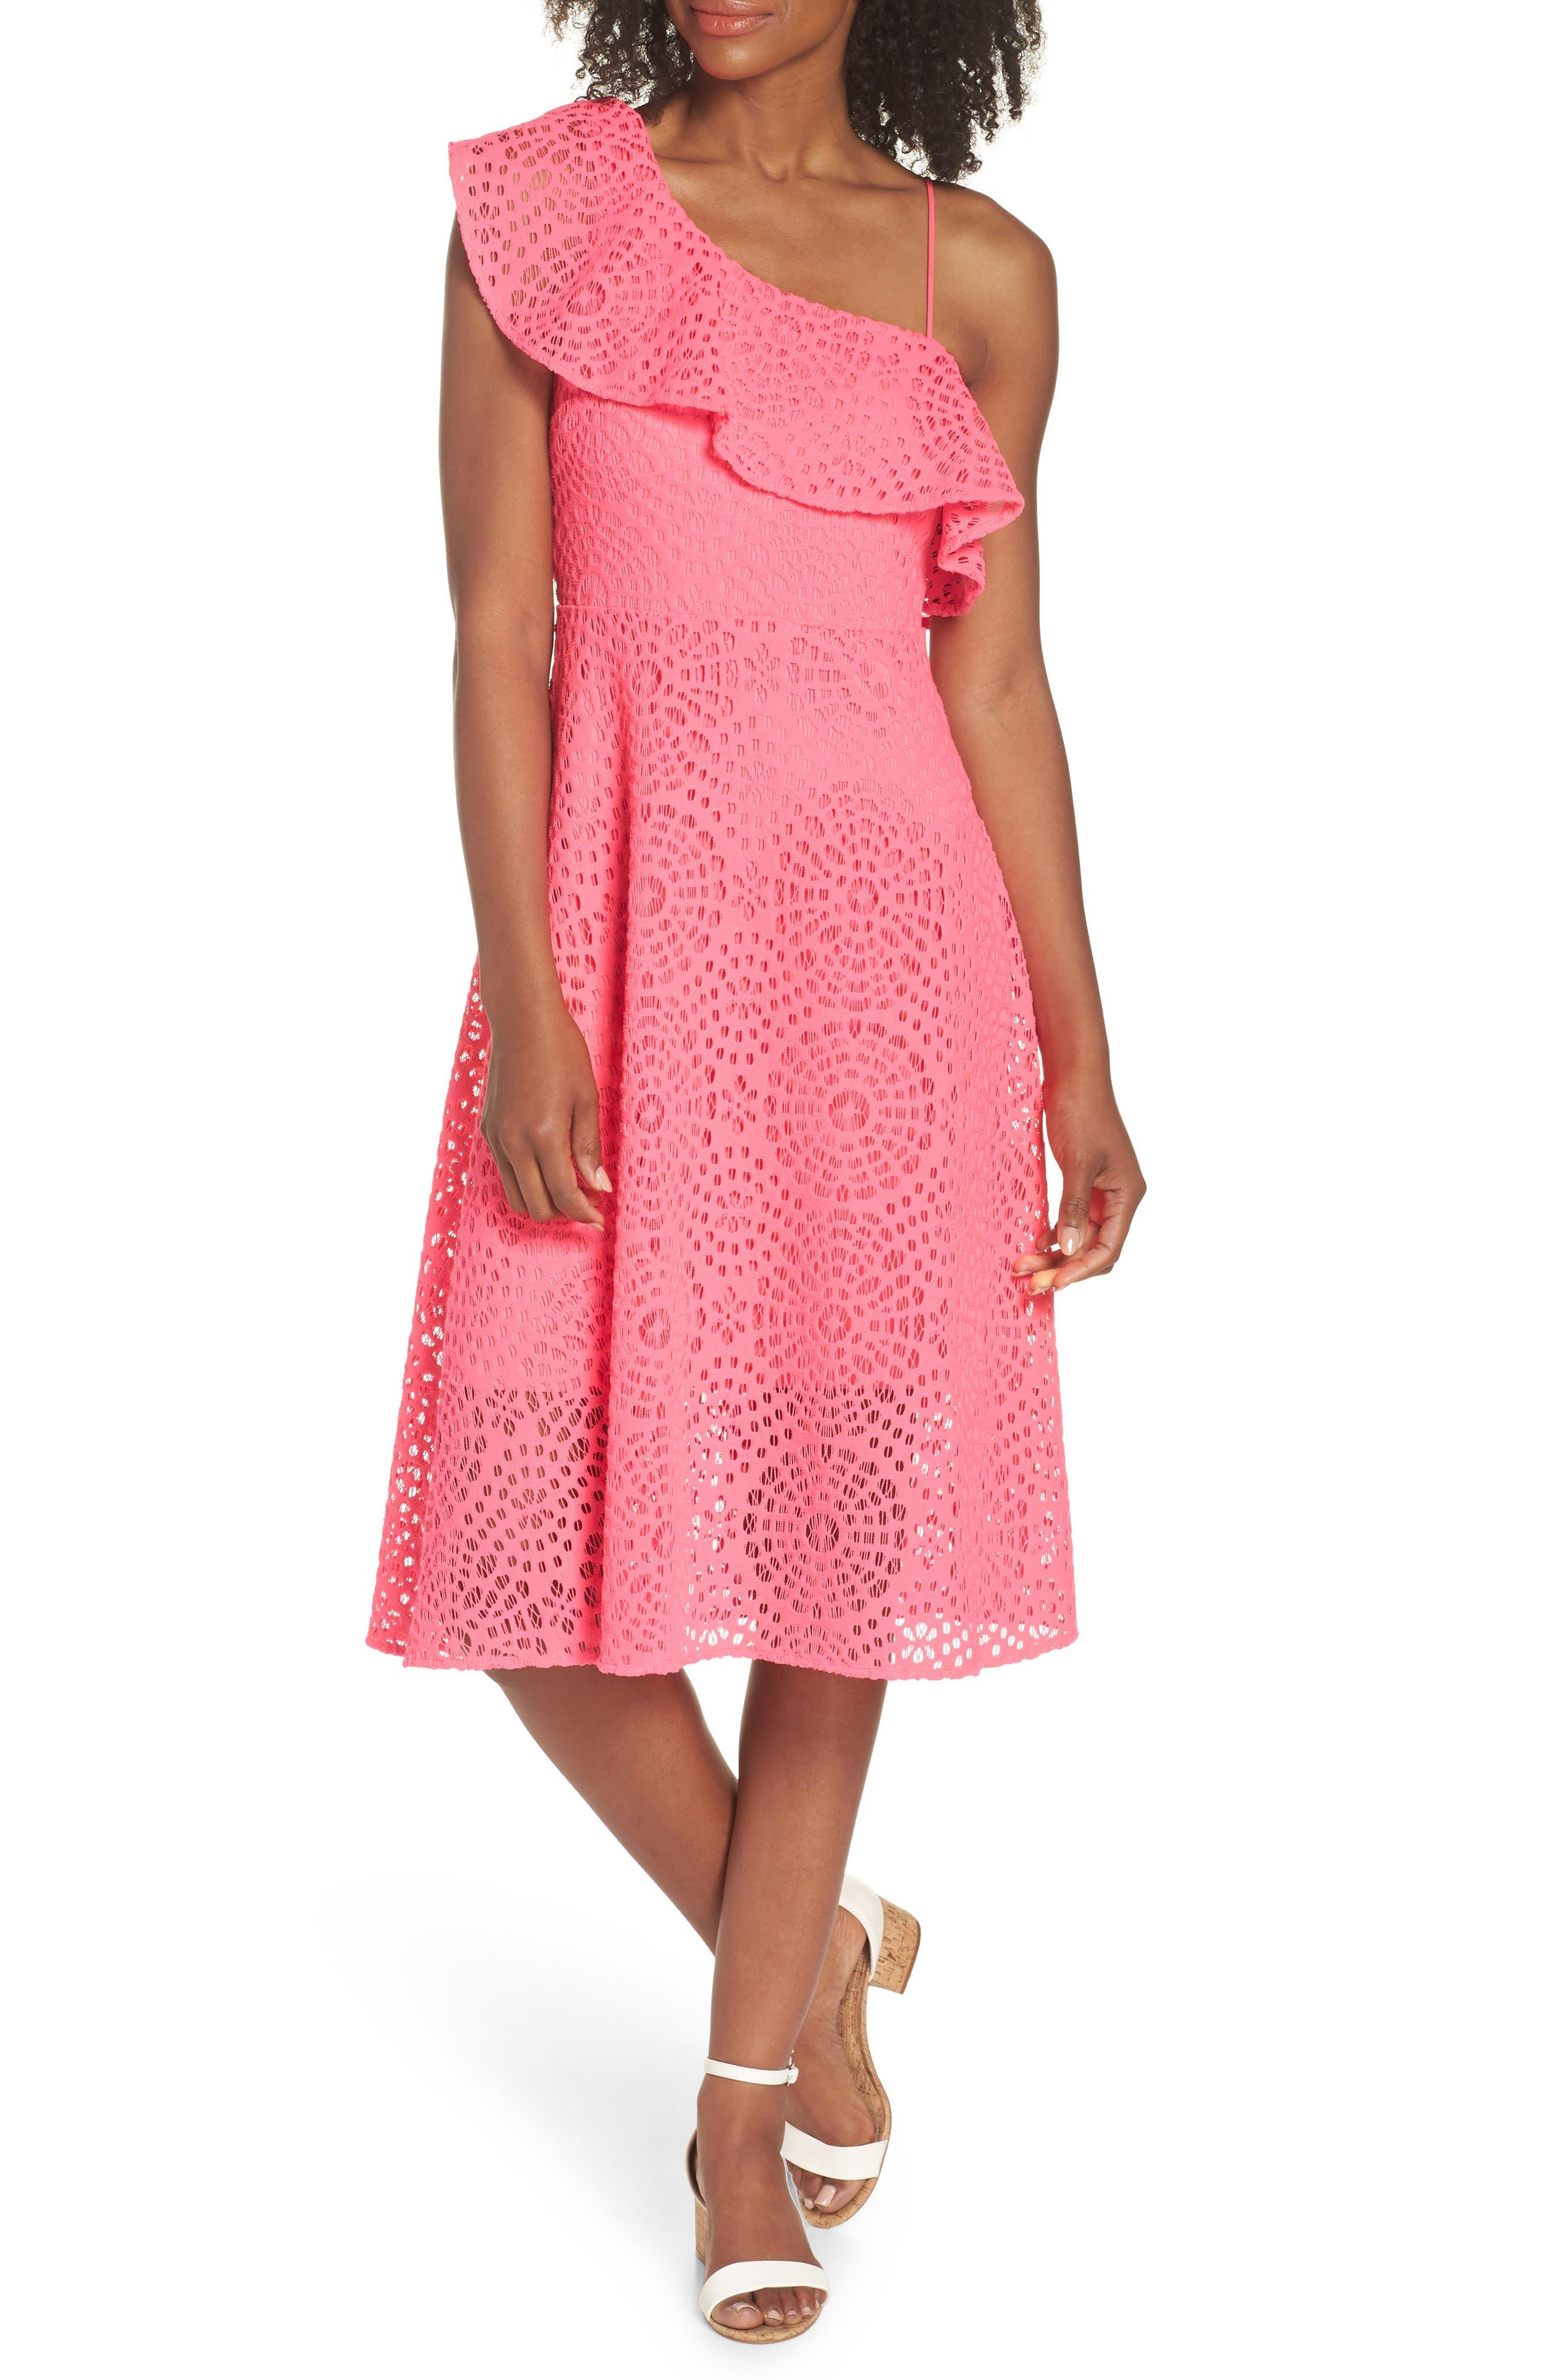 Callisto Ruffle One-Shoulder Midi Dress,                             Alternate thumbnail 5, color,                             PINK SEA URCHIN TERRY LACE